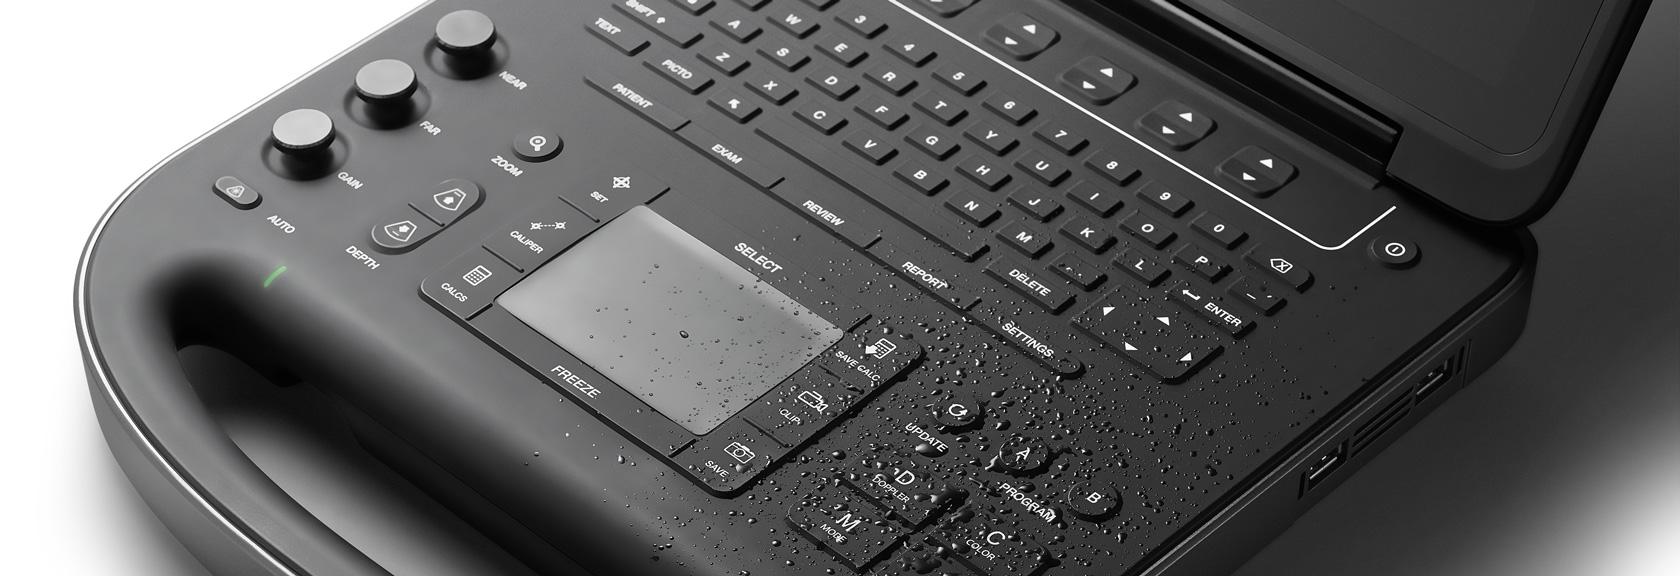 [photo] SonoSite Edge II black keyboard with water splashed on it